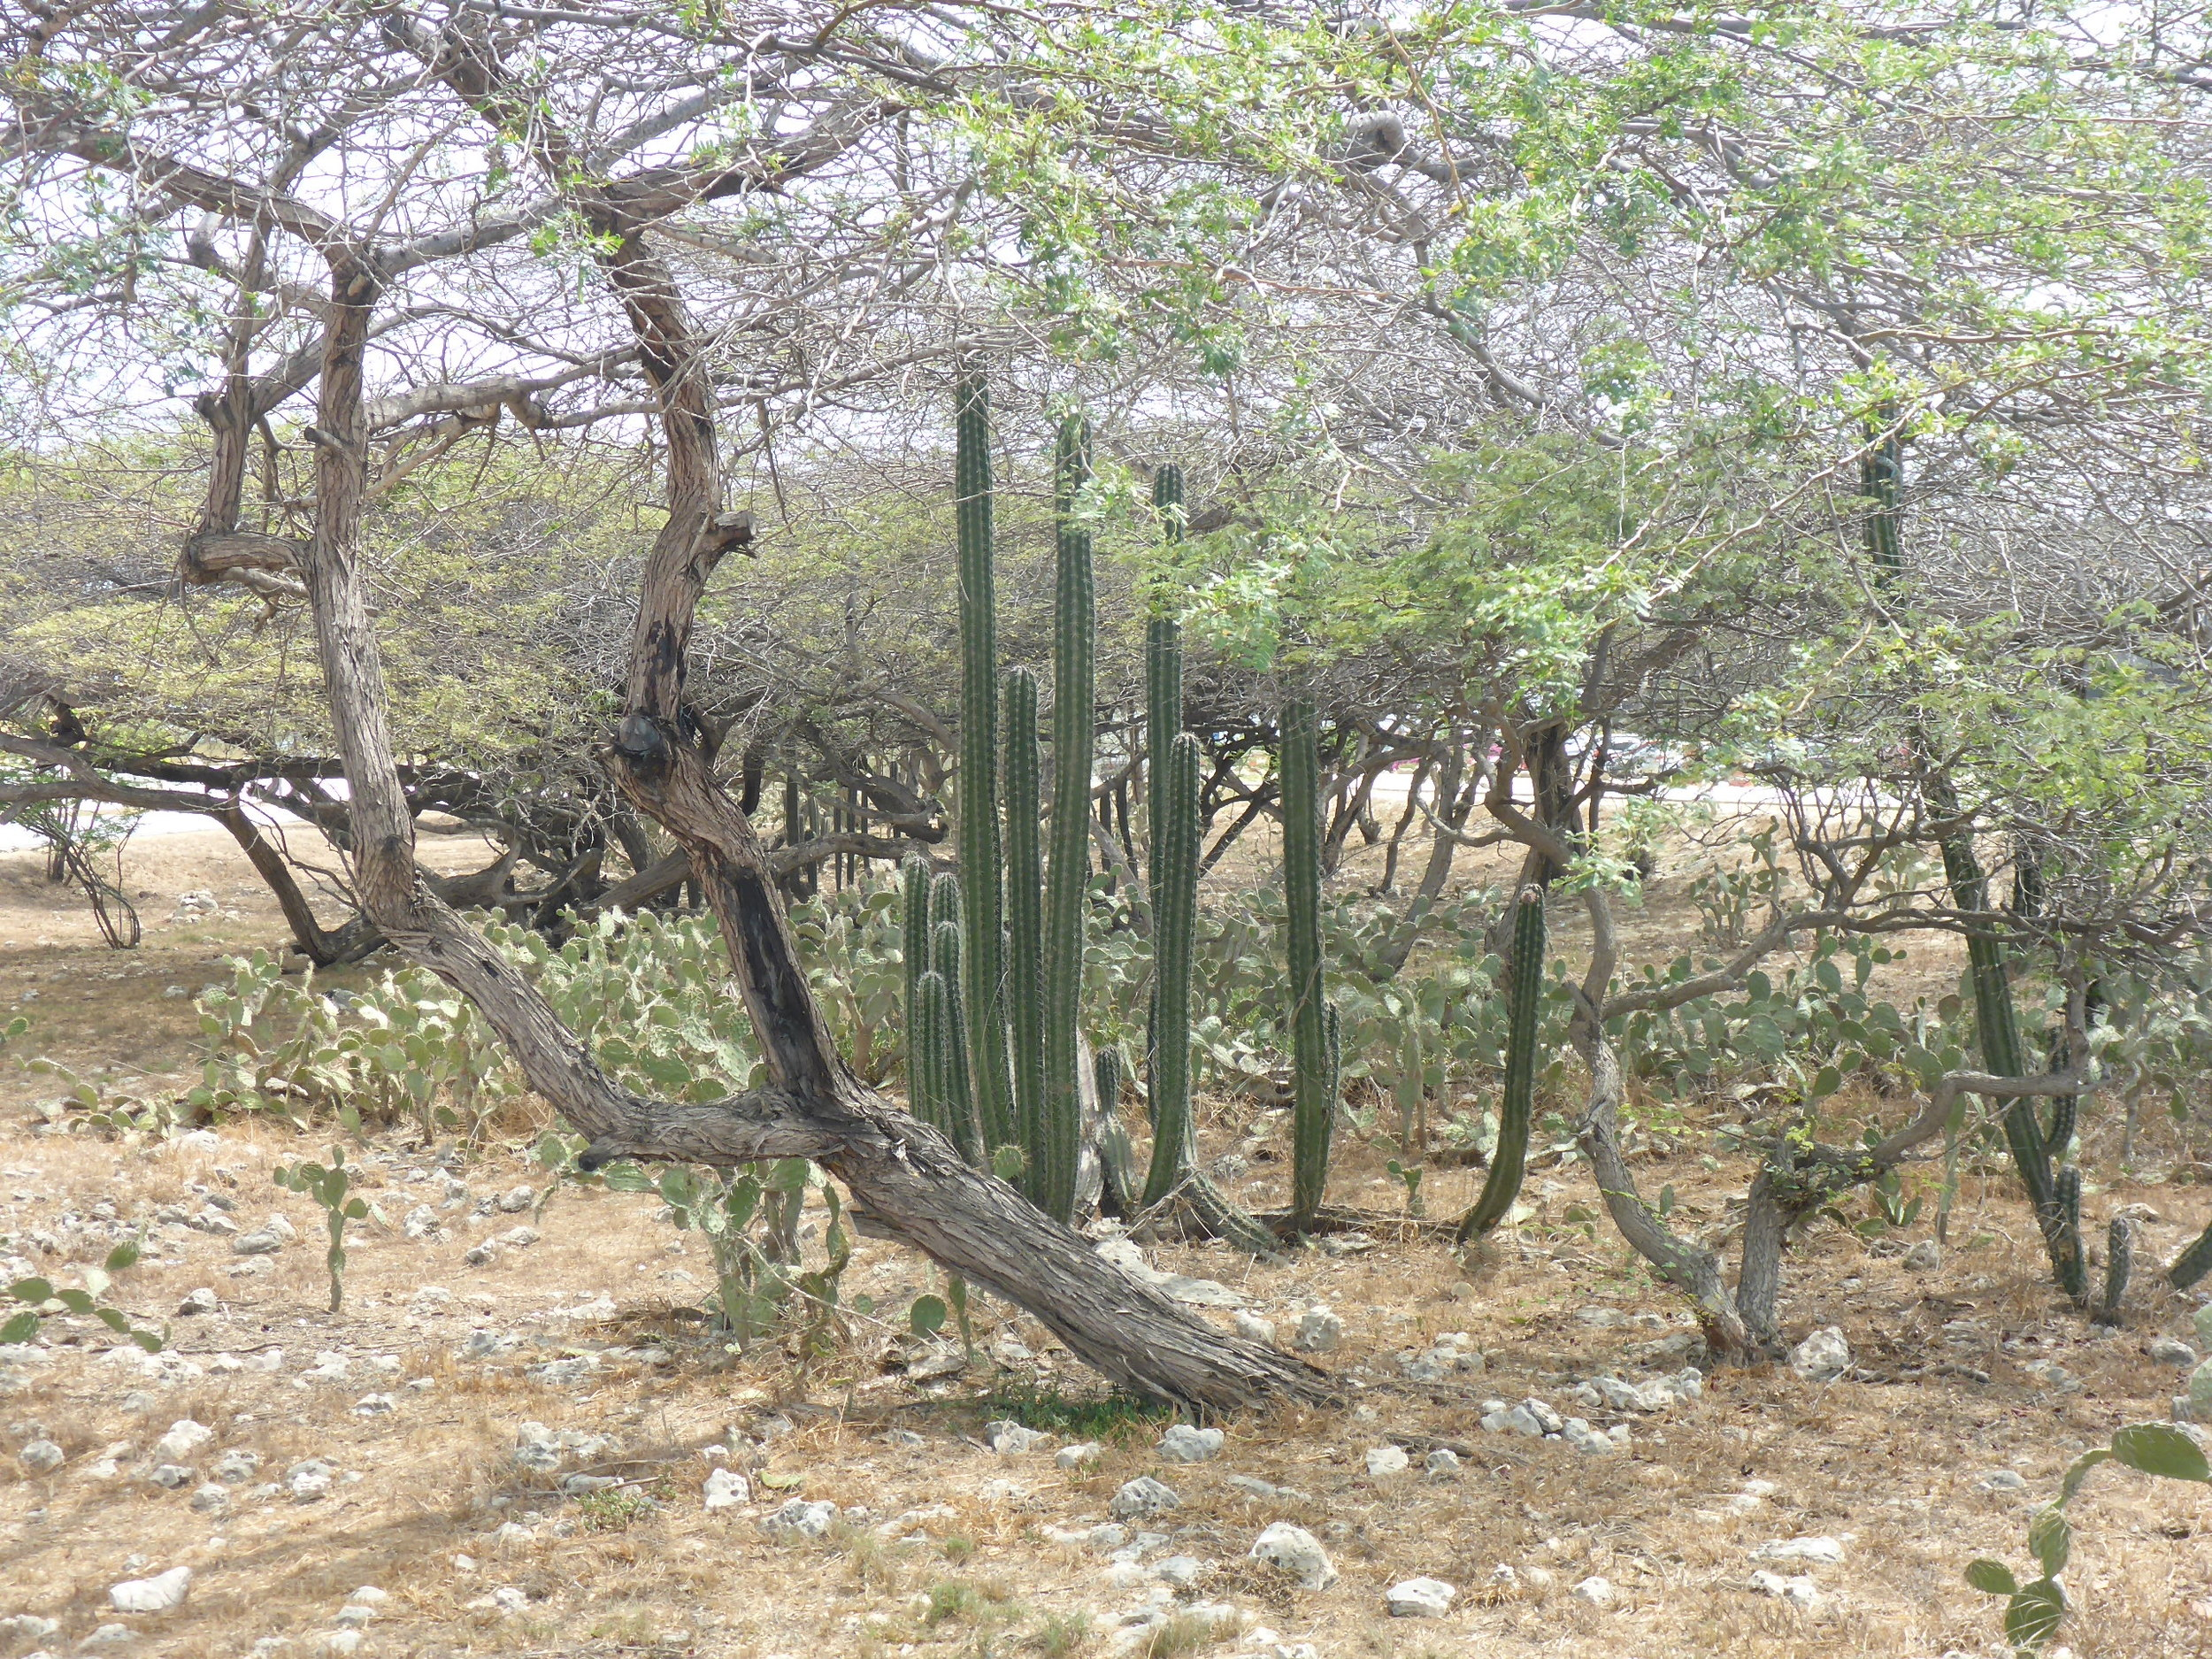 Aruban scrub - cacti and acacias